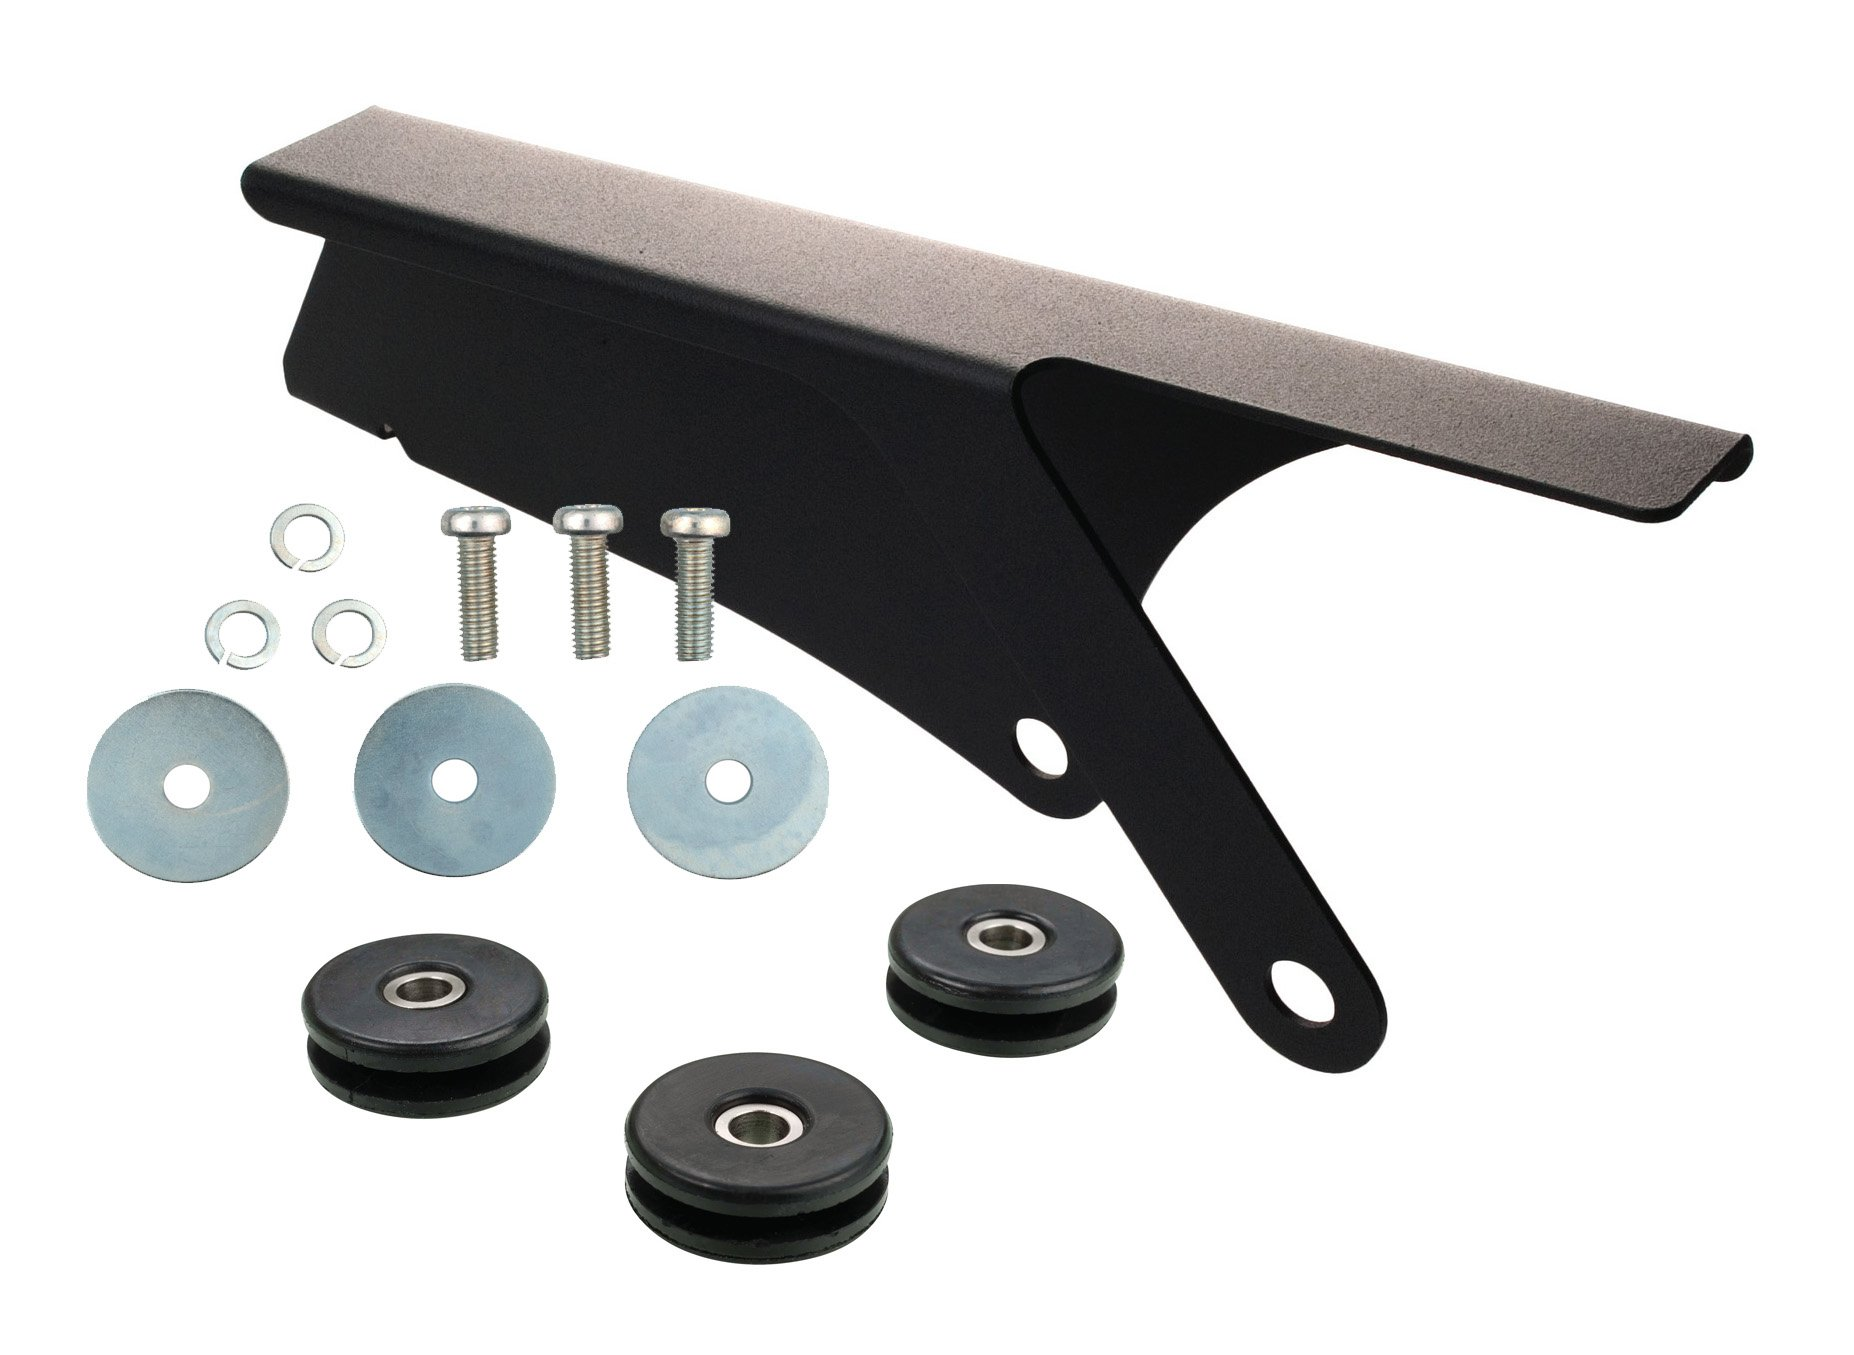 Mini Chain Guard With Mounting Hardware -  Matt Black Aluminum Anodized 3-105